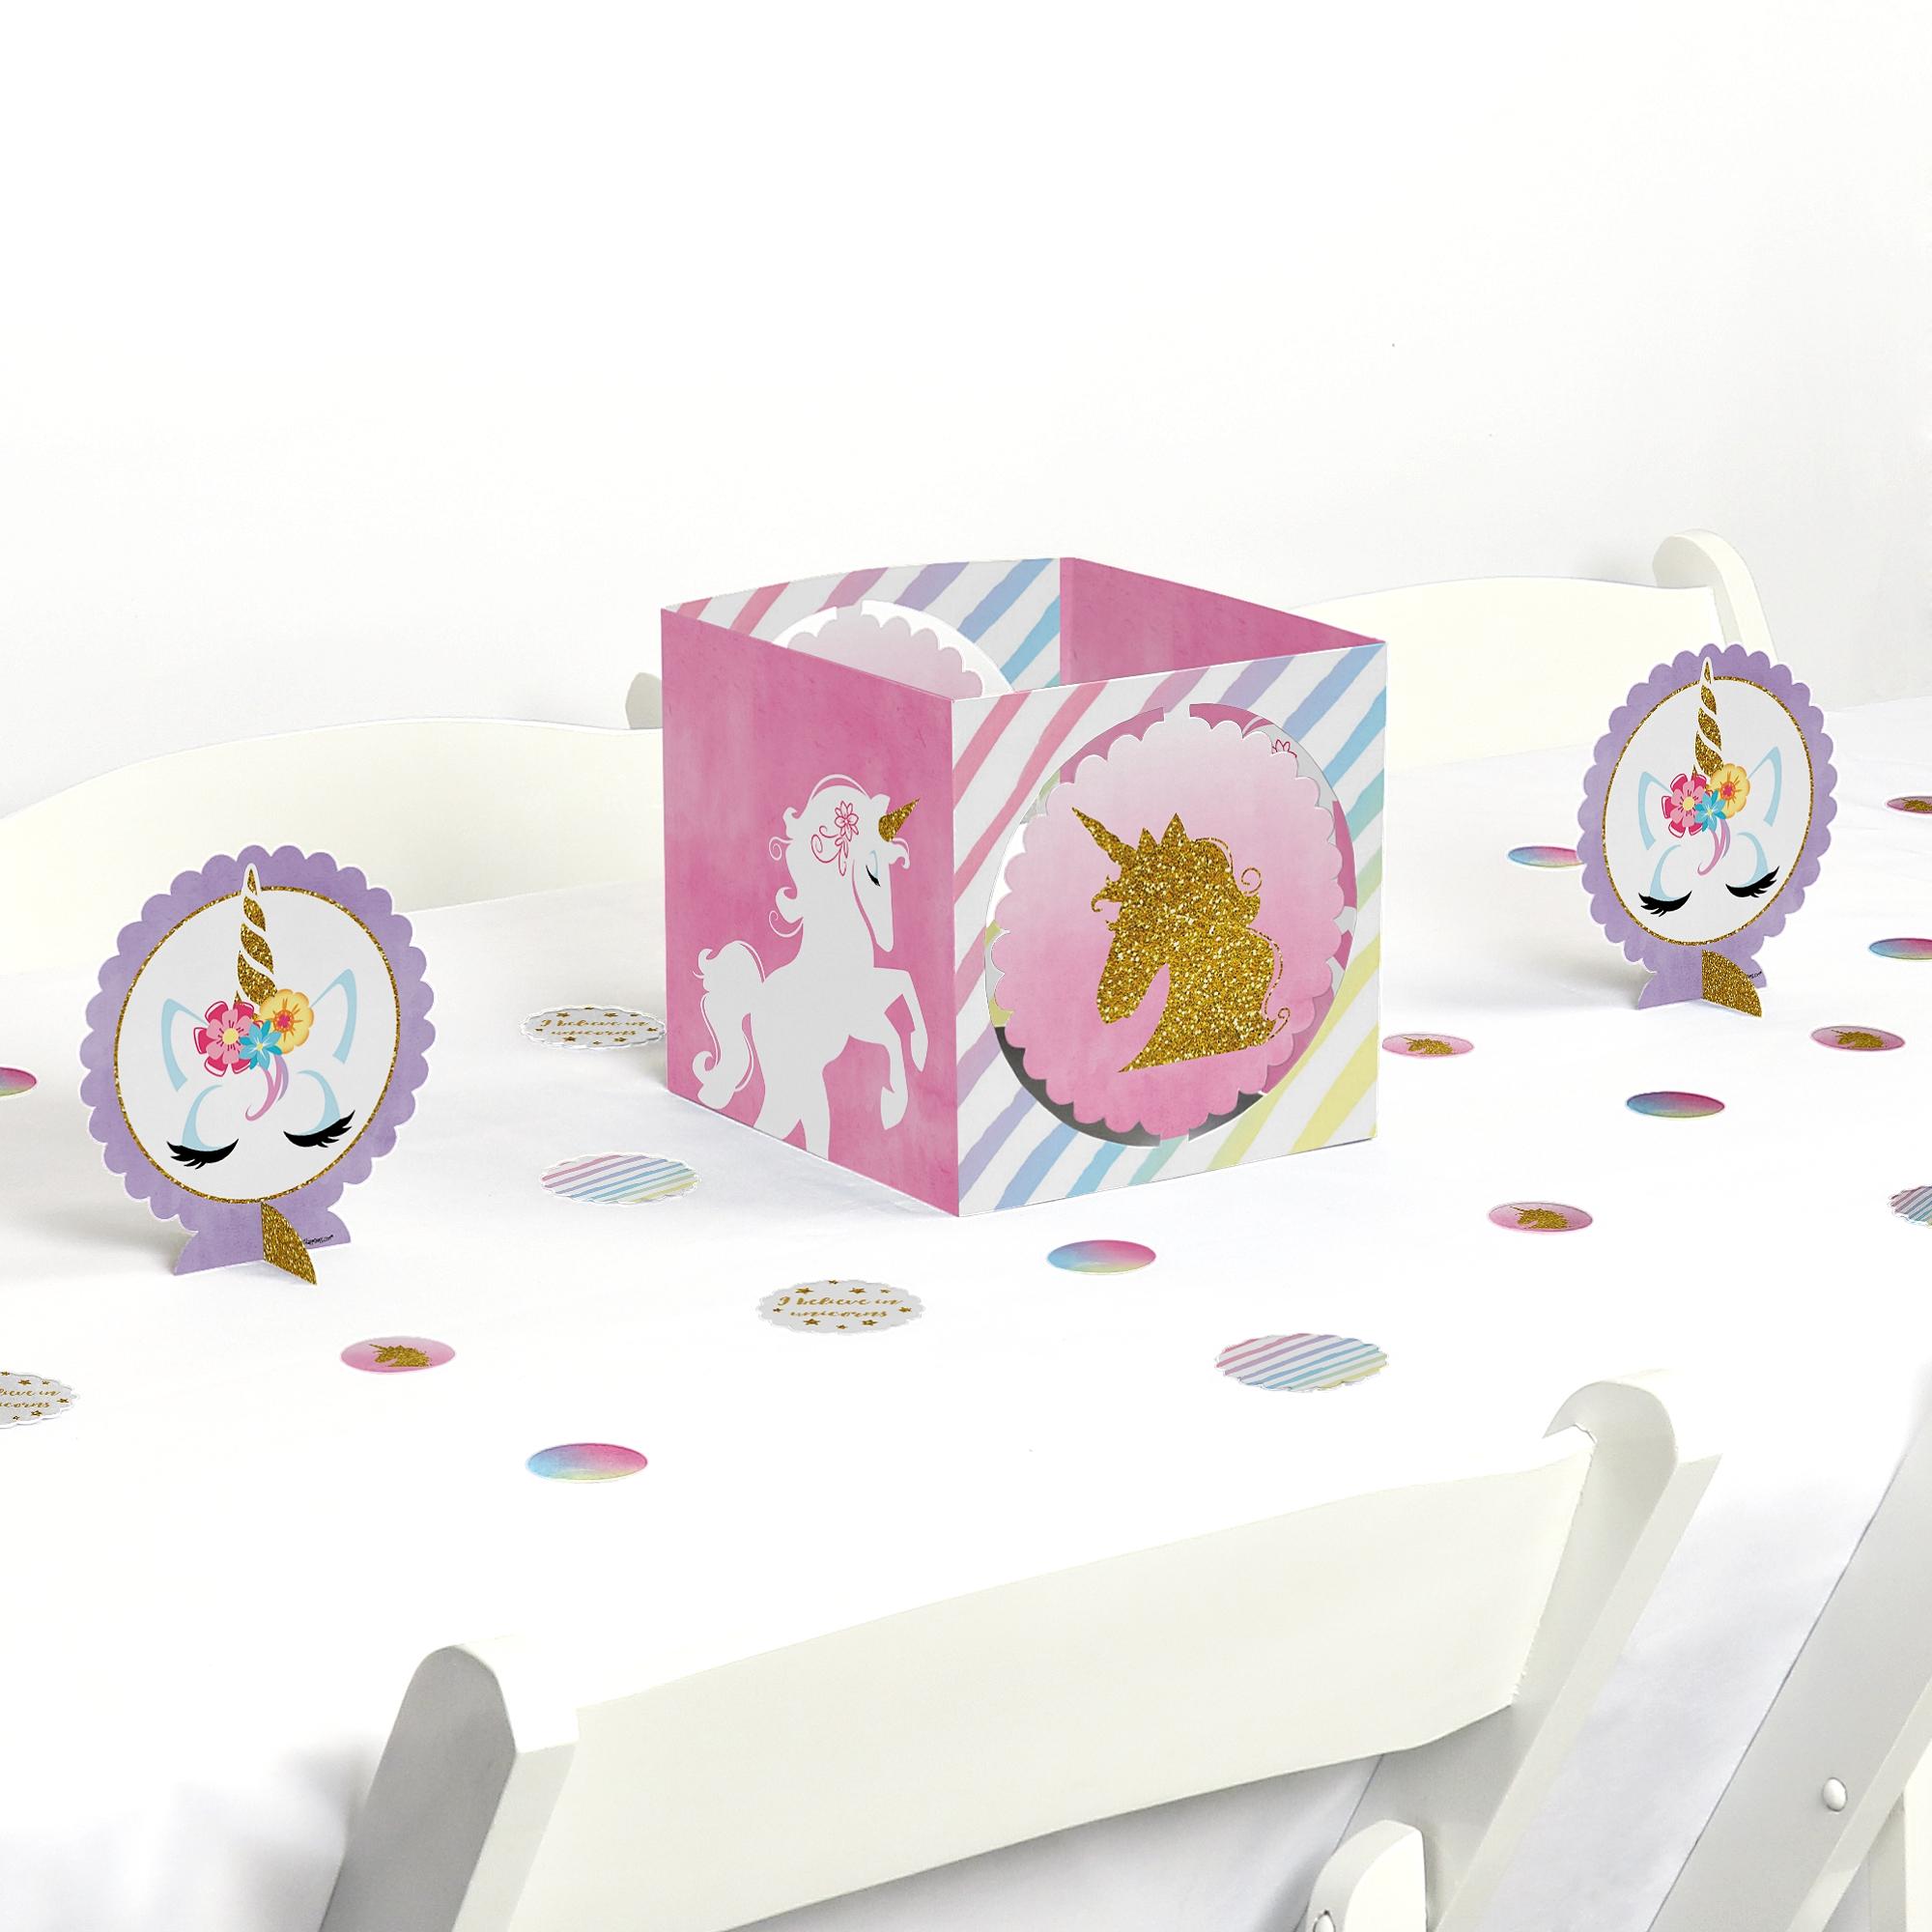 Rainbow Unicorn - Magical Unicorn Baby Shower or Birthday Party Centerpiece & Table Decoration Kit